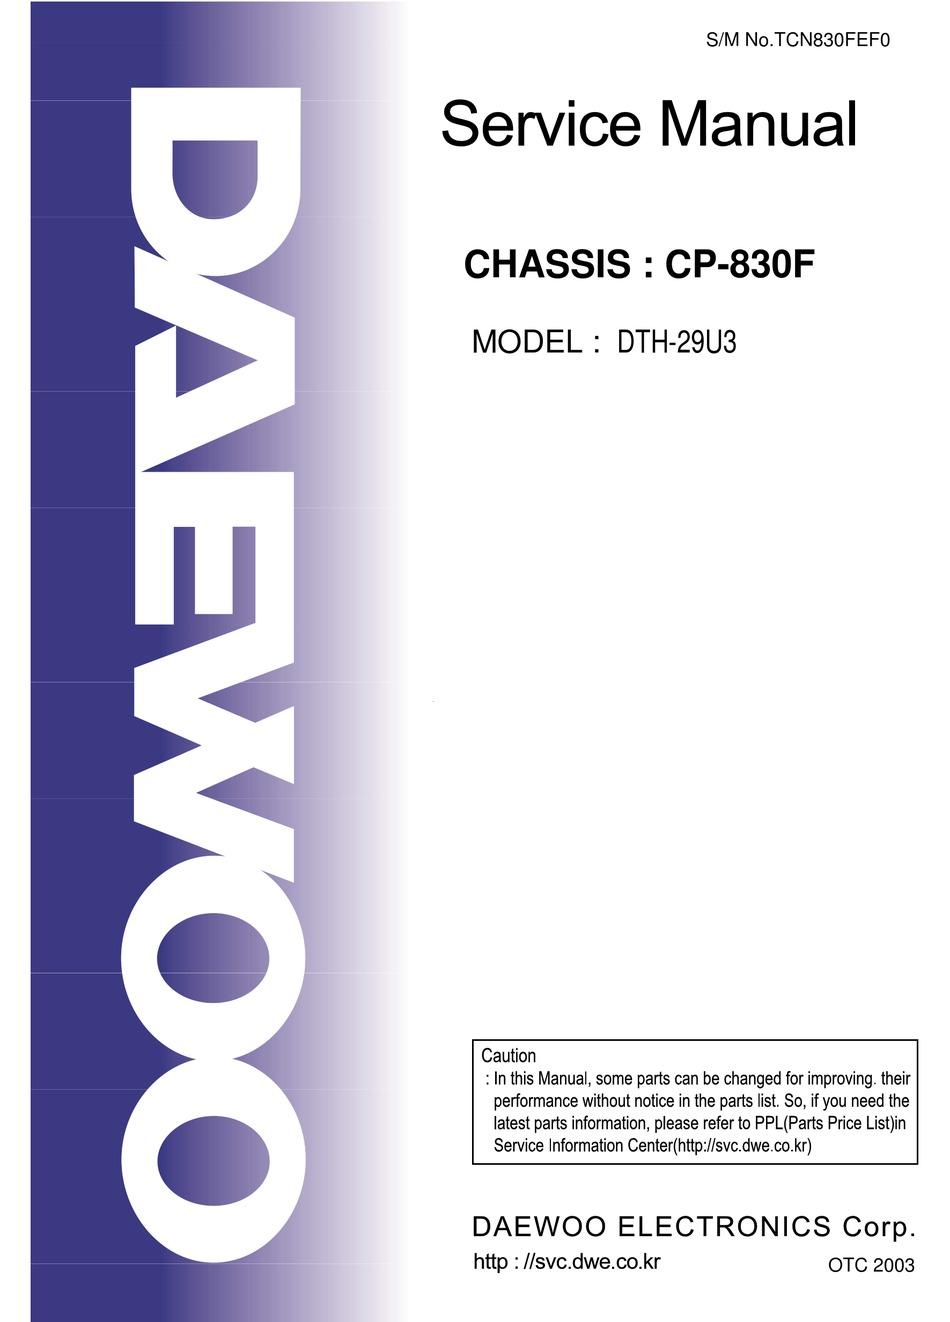 Daewoo Dth 29u3 Service Manual Pdf Download Manualslib